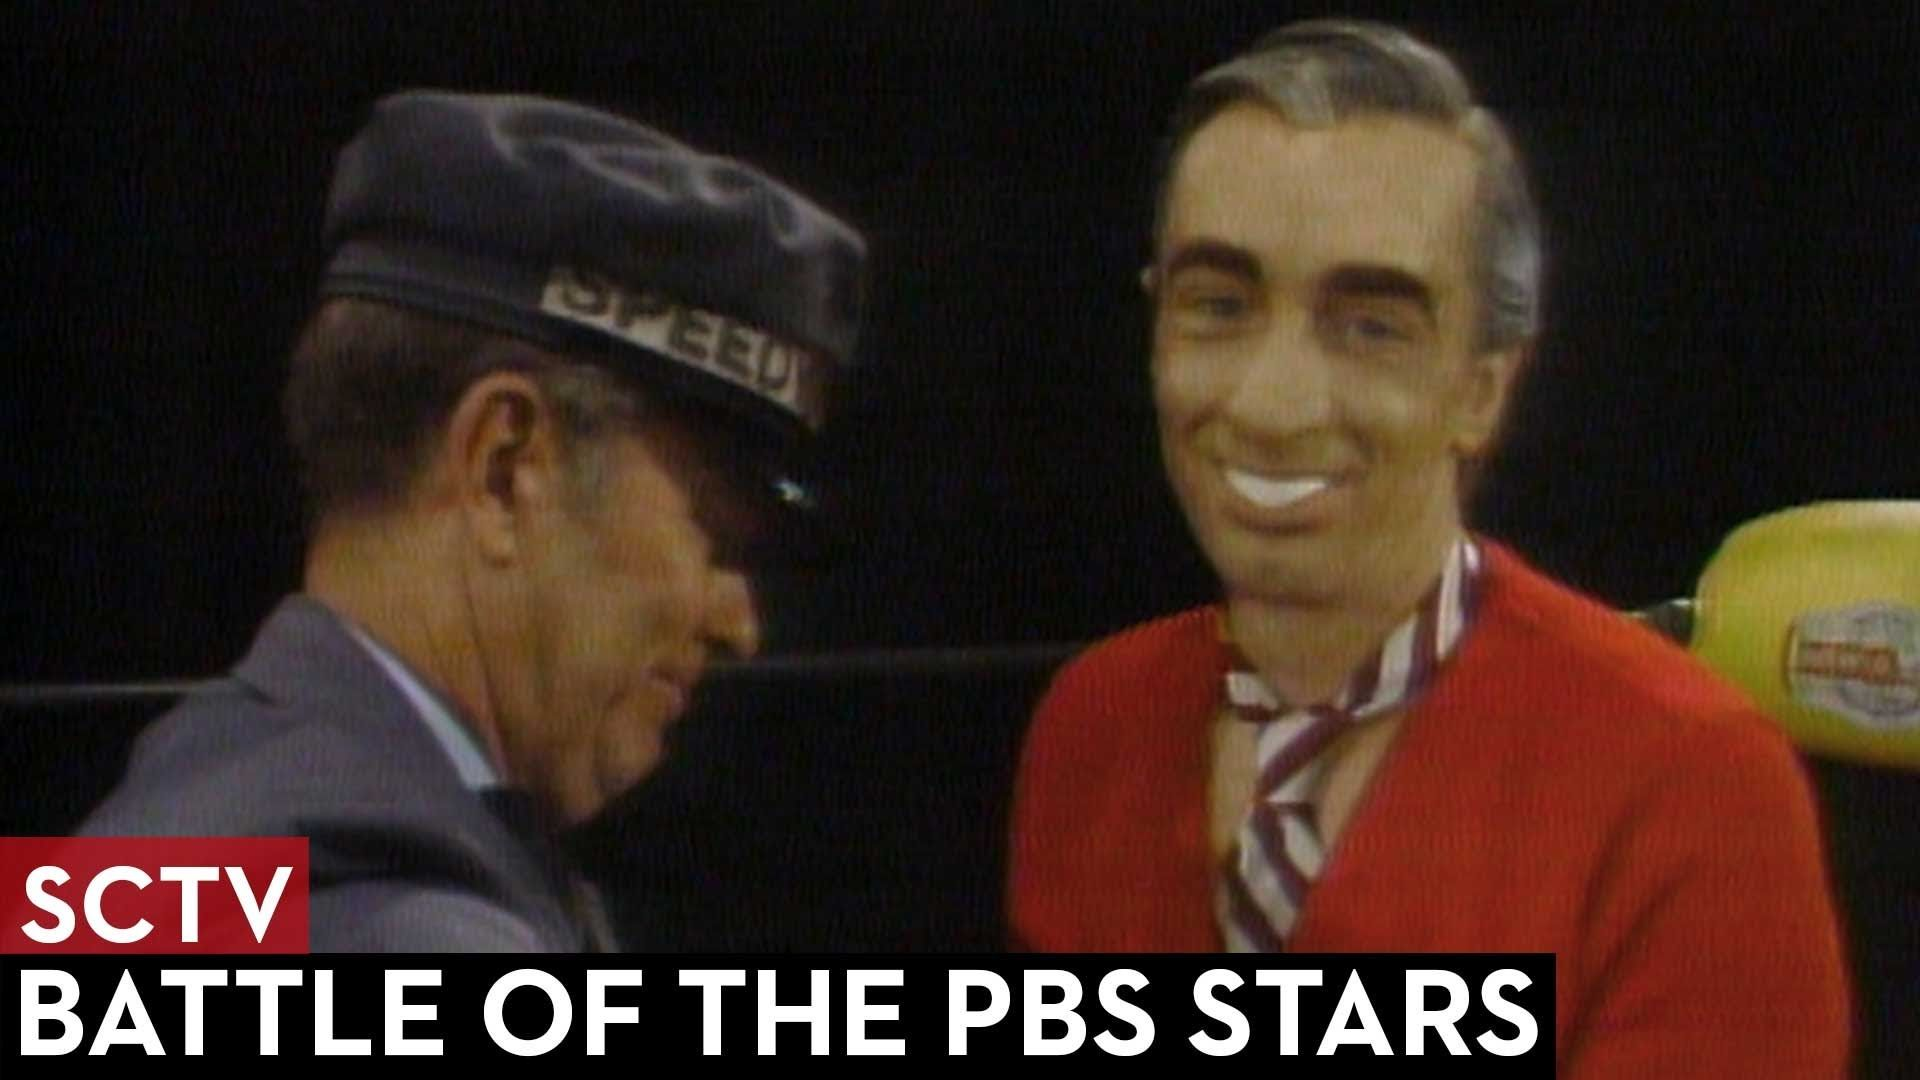 SCTV - Battle of the PBS Stars - Mr  Rogers vs  Julia Child | Funny